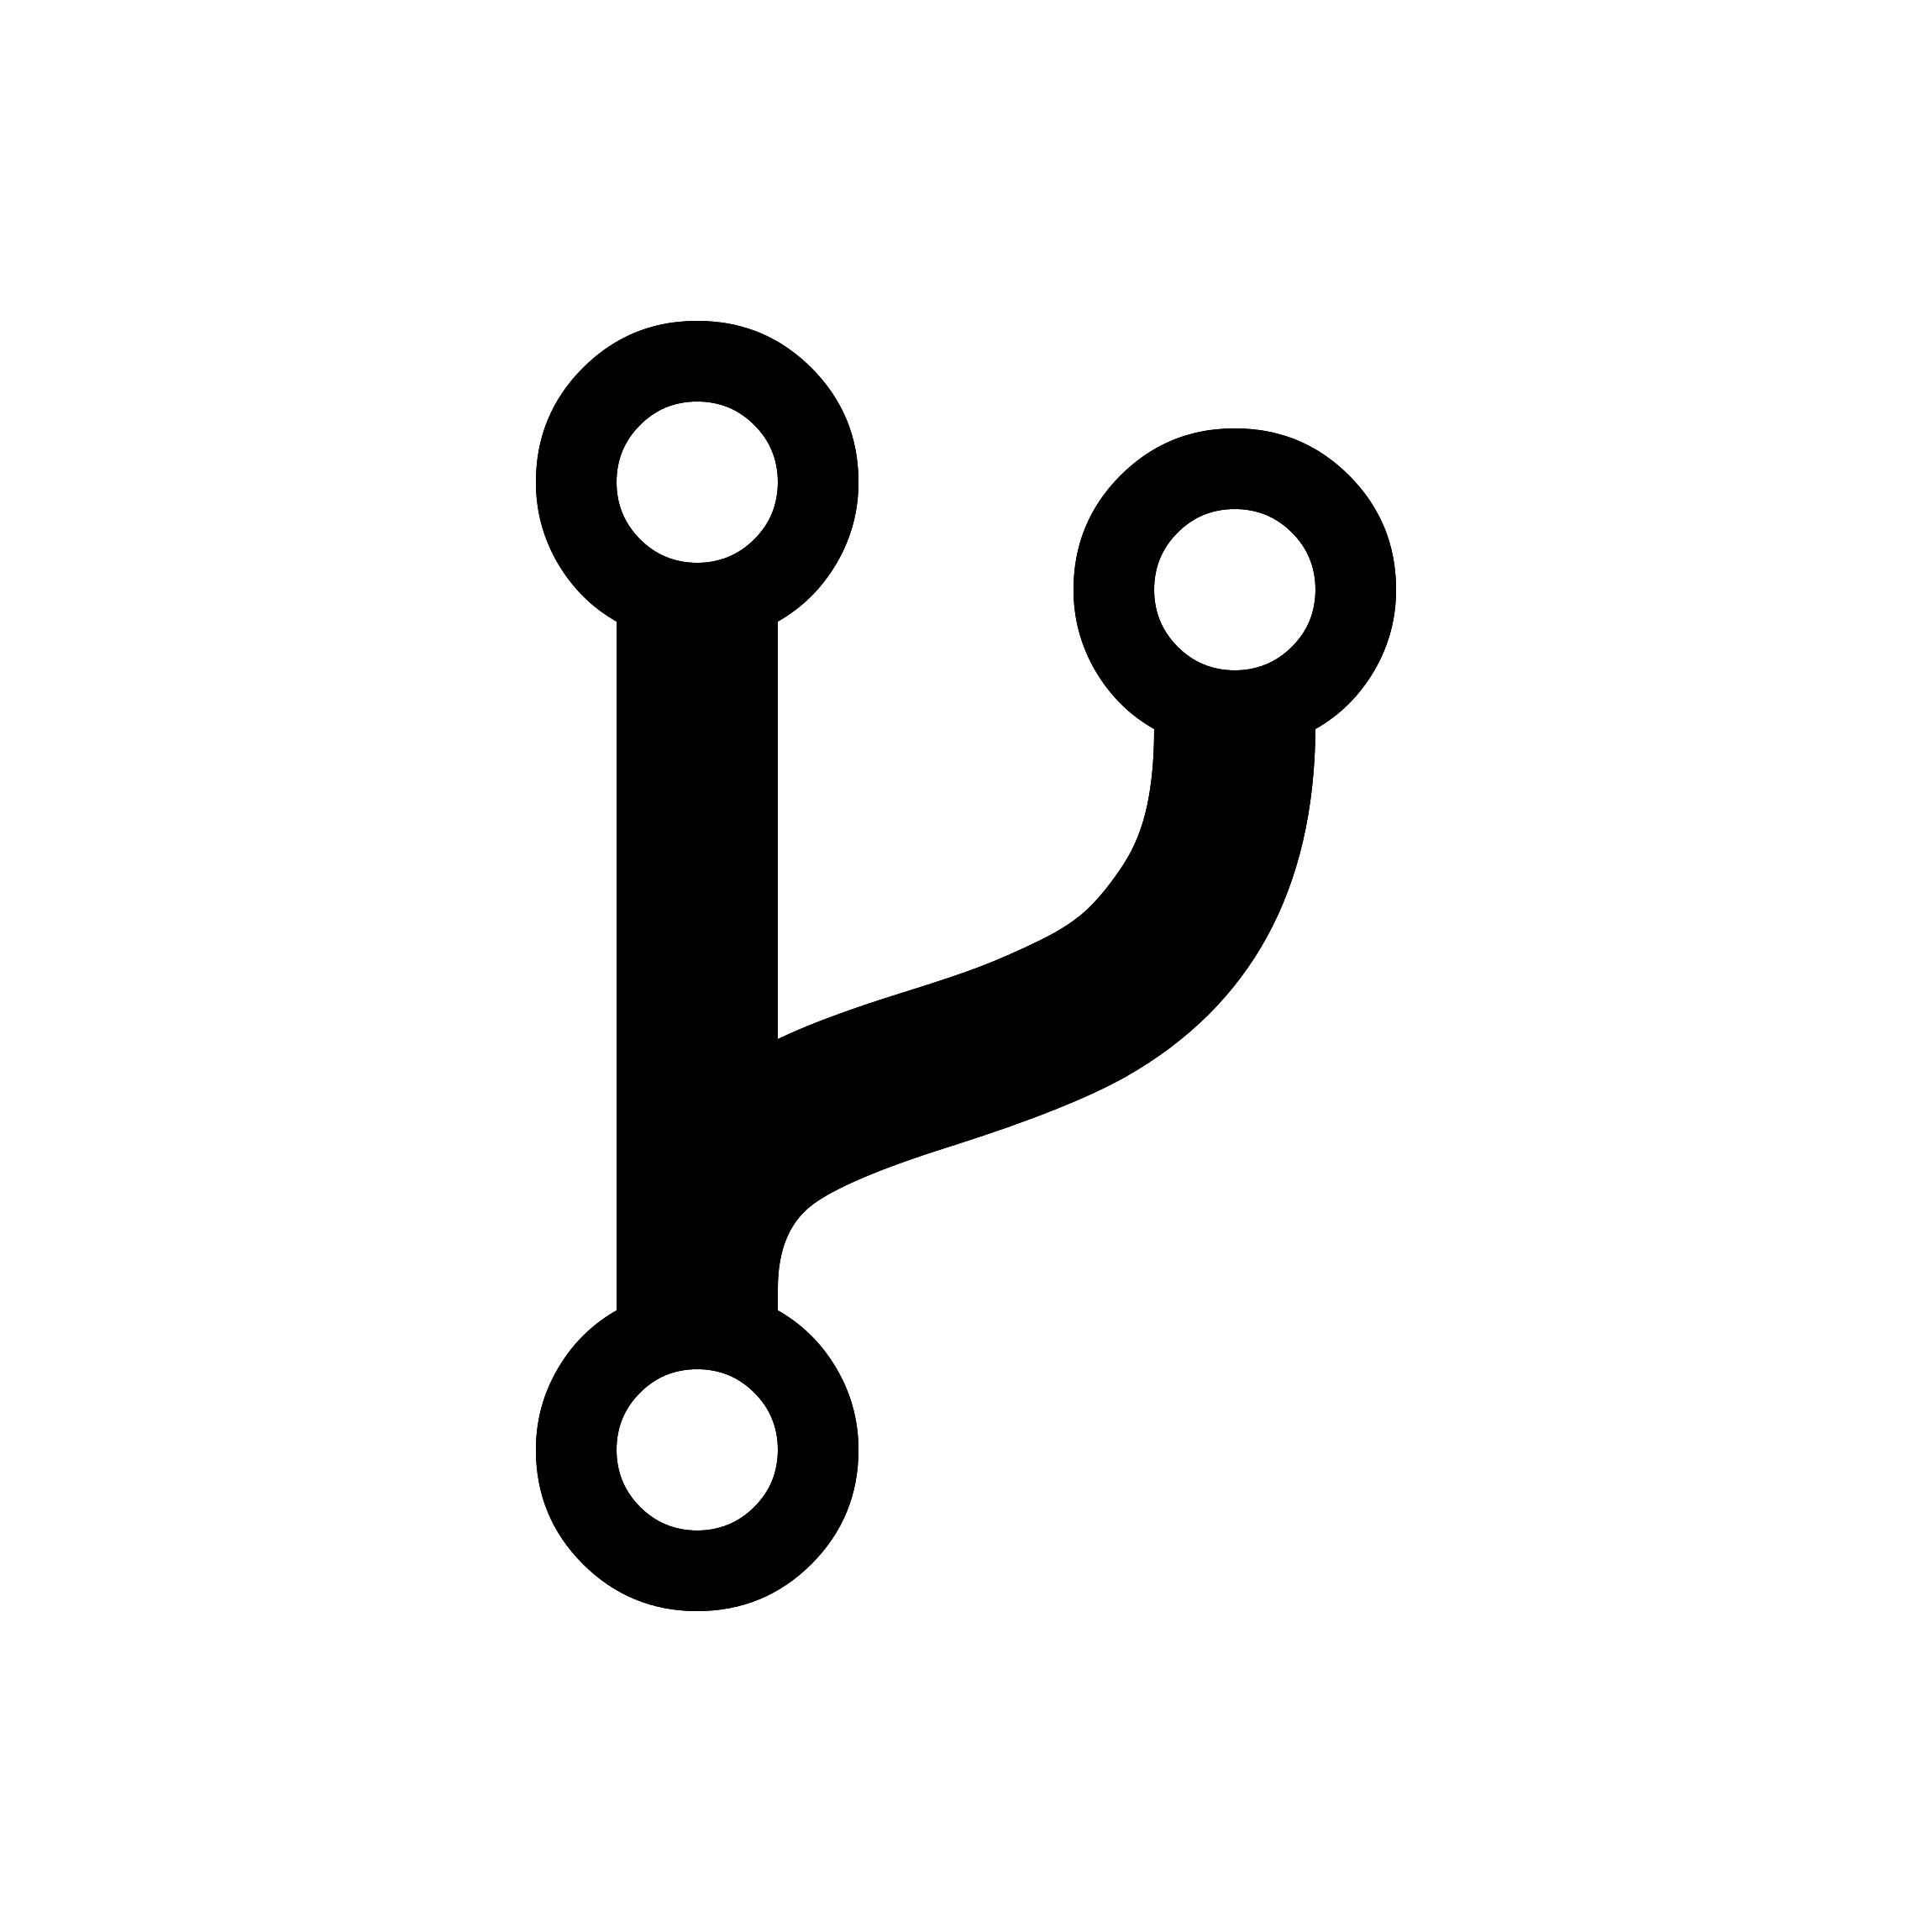 data/images/code-fork.png